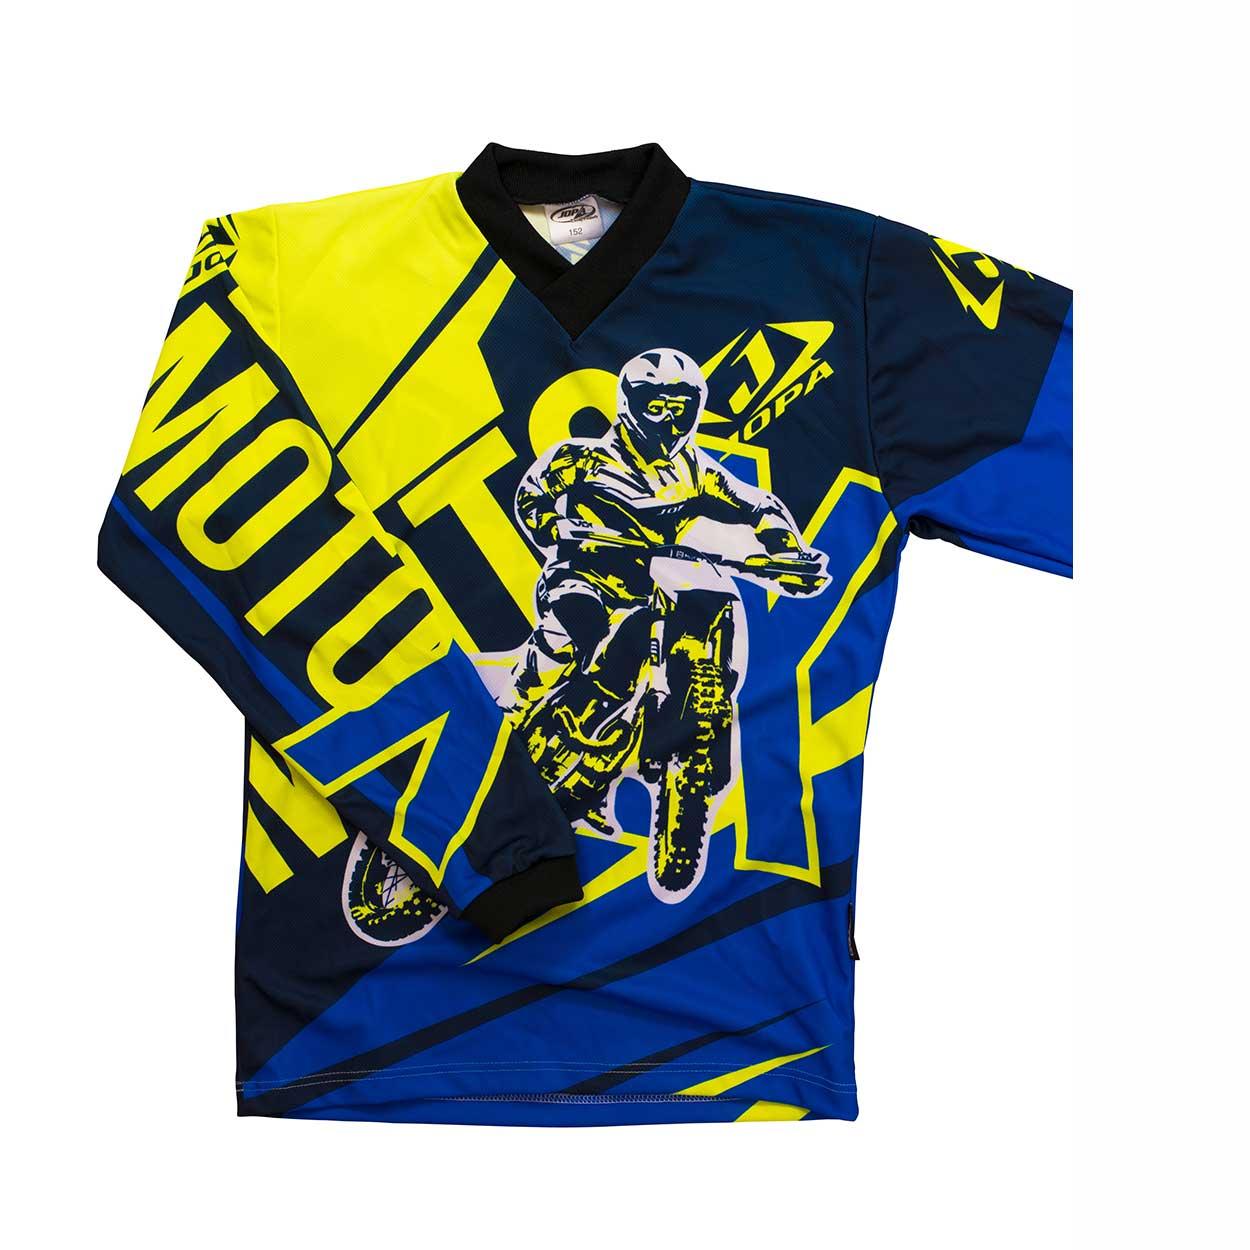 Jopa Kinder Shirt Moto-X Blue/Neon-86